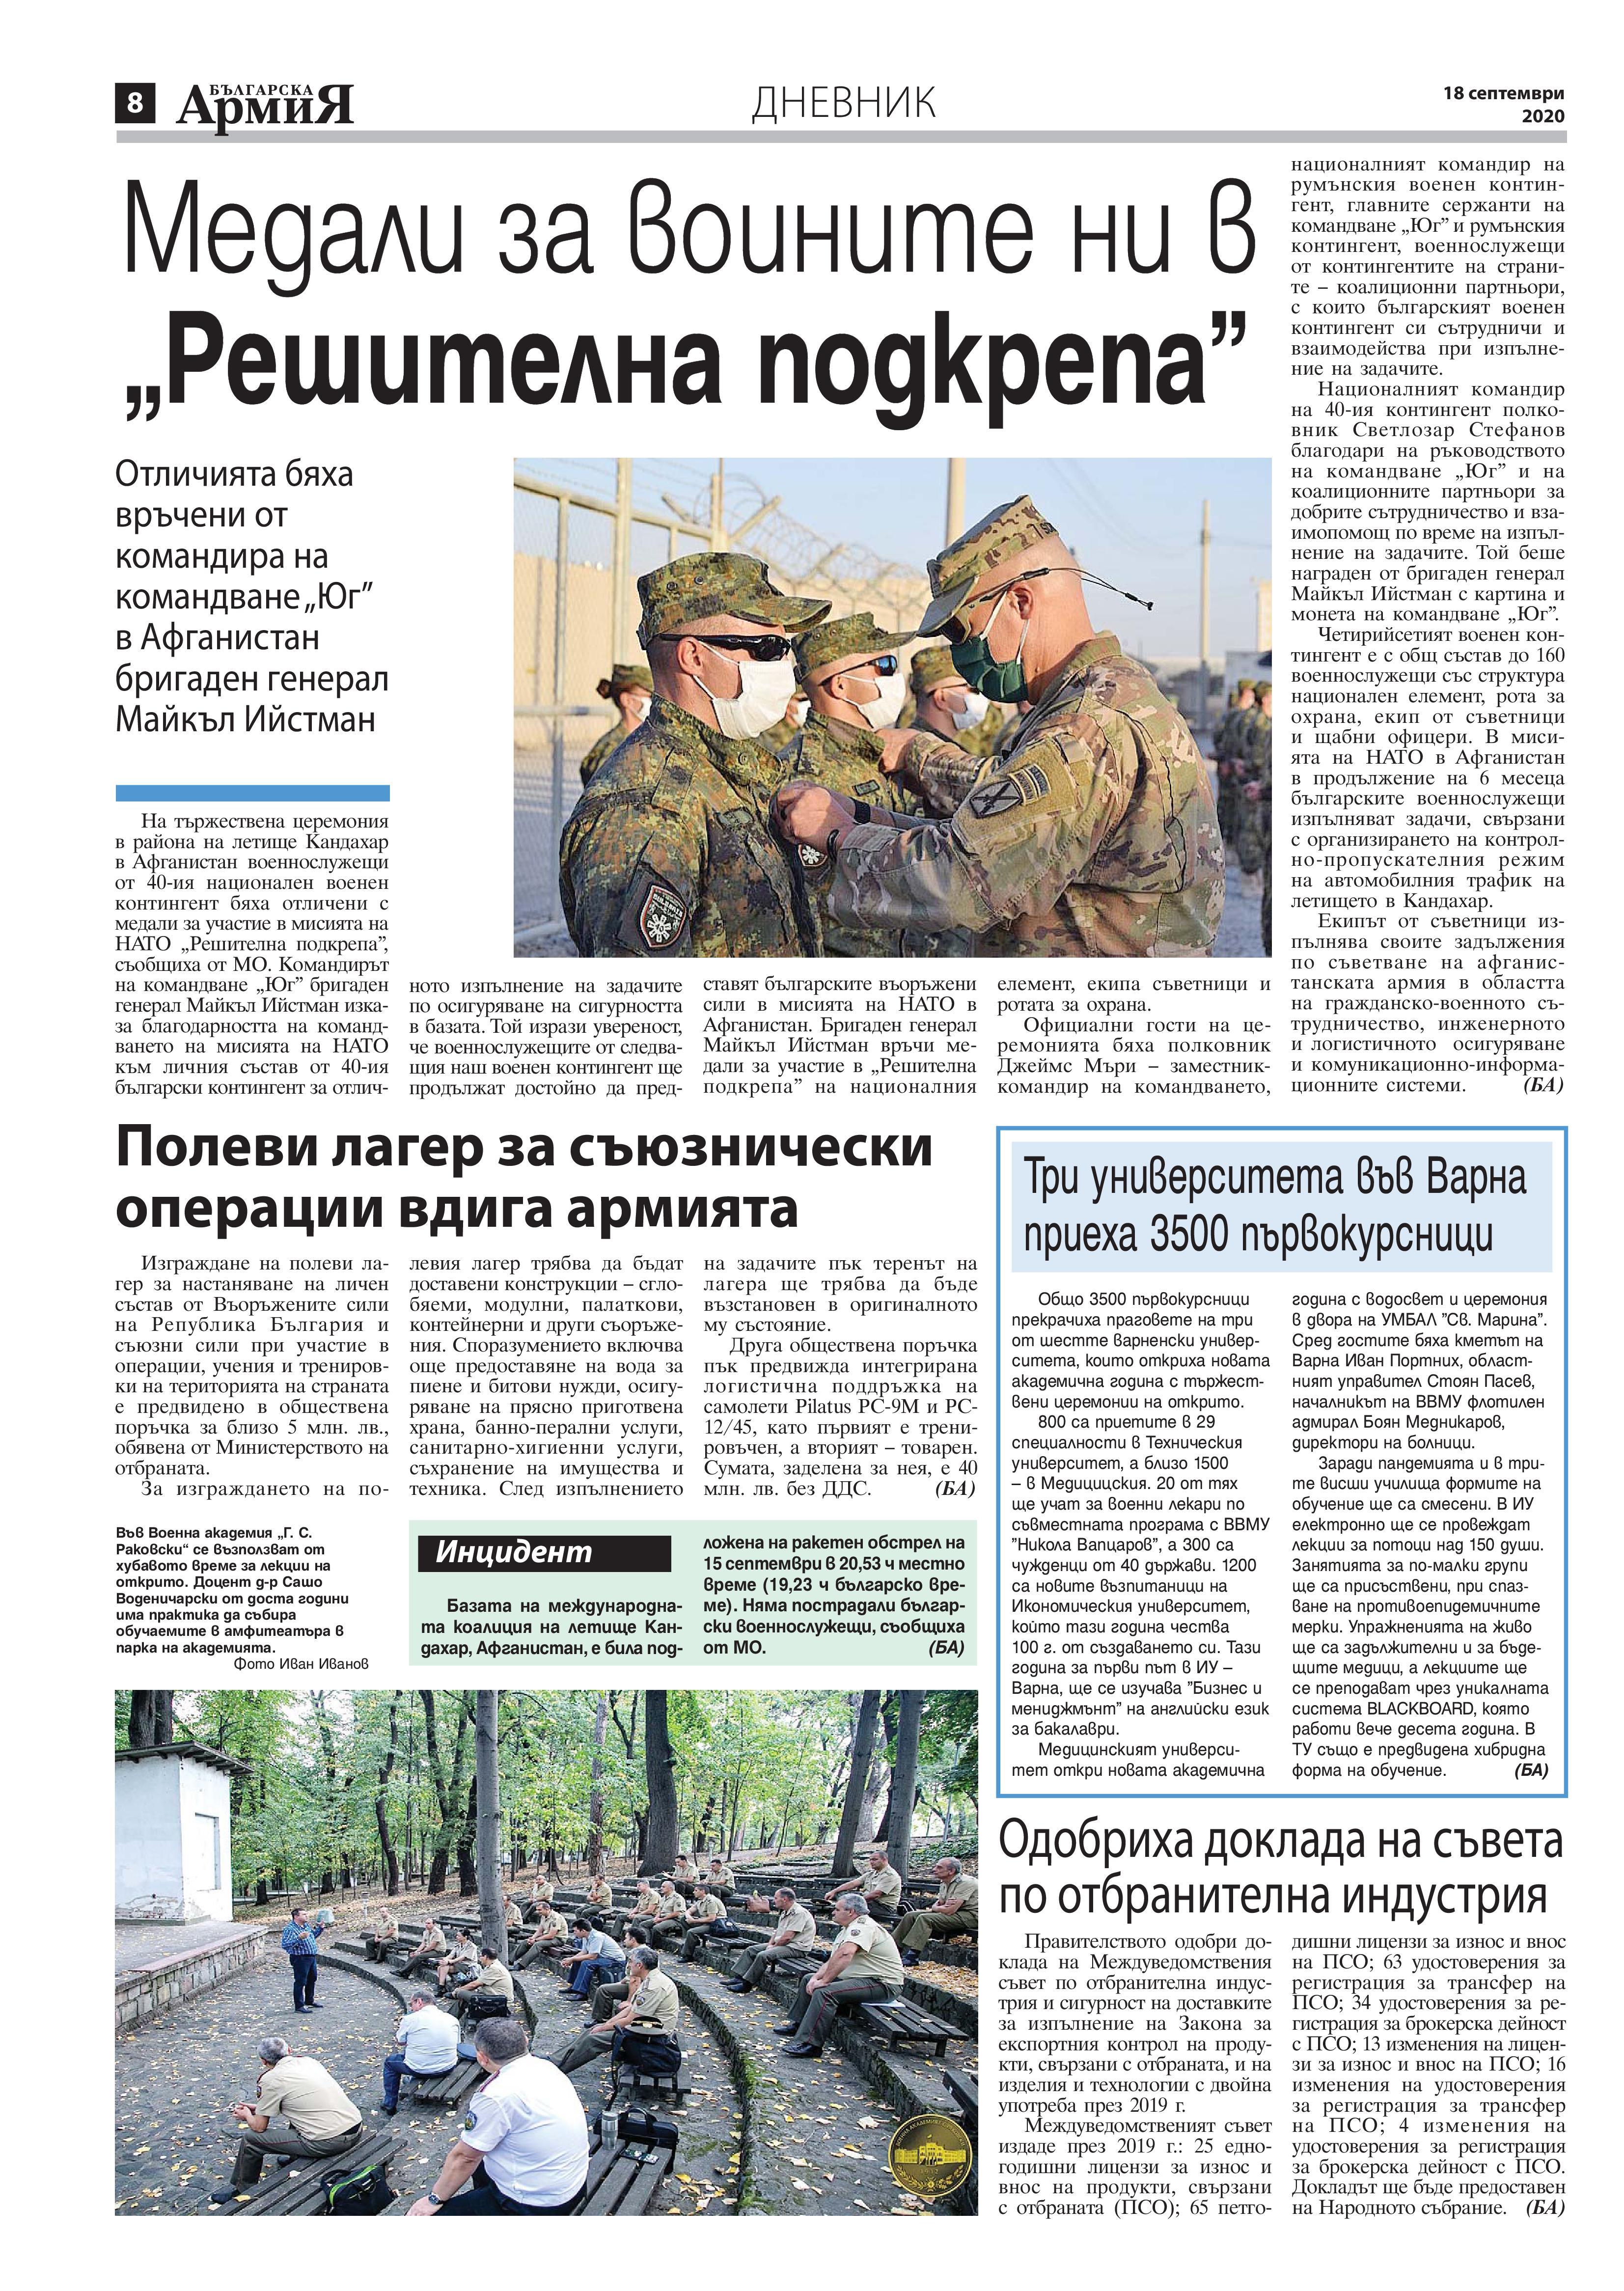 https://armymedia.bg/wp-content/uploads/2015/06/08-40.jpg